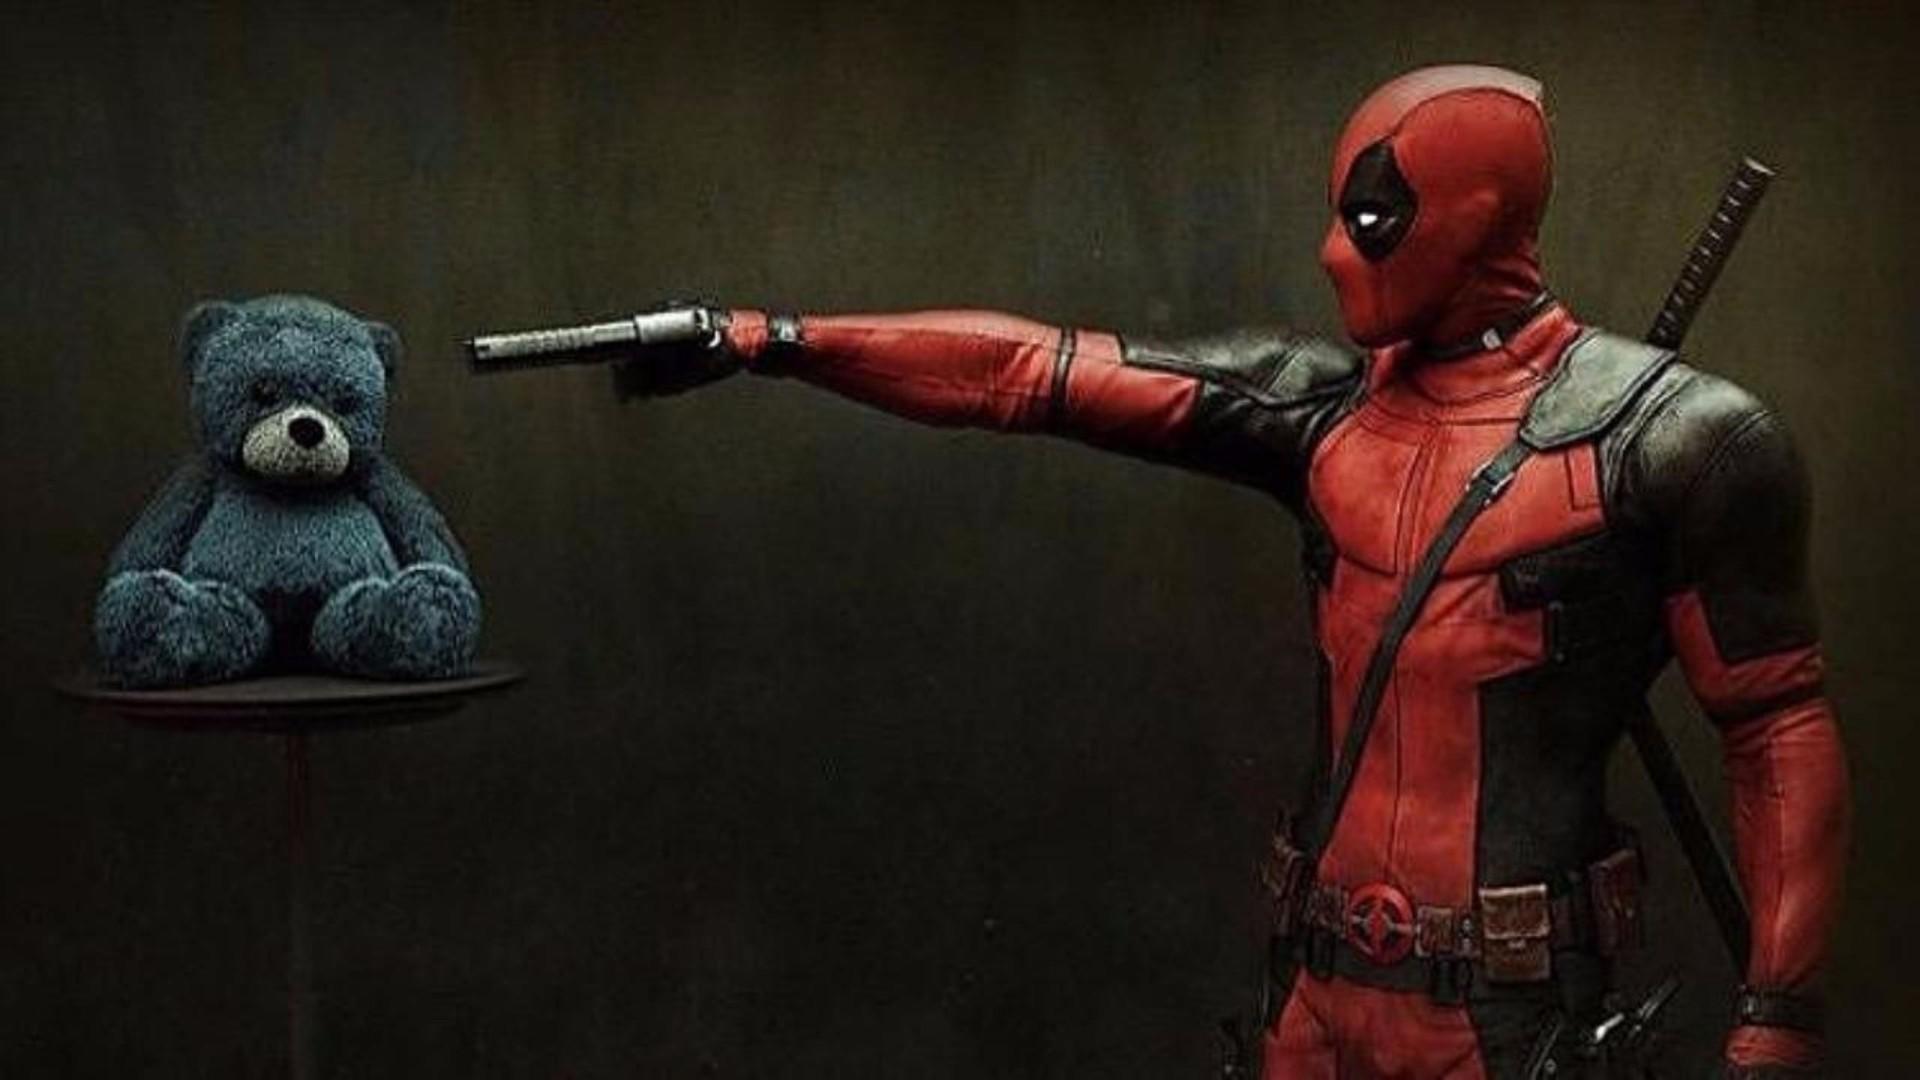 Top 2016 Deadpool Movie 4K Wallpaper 4K Wallpaper 1920x1080